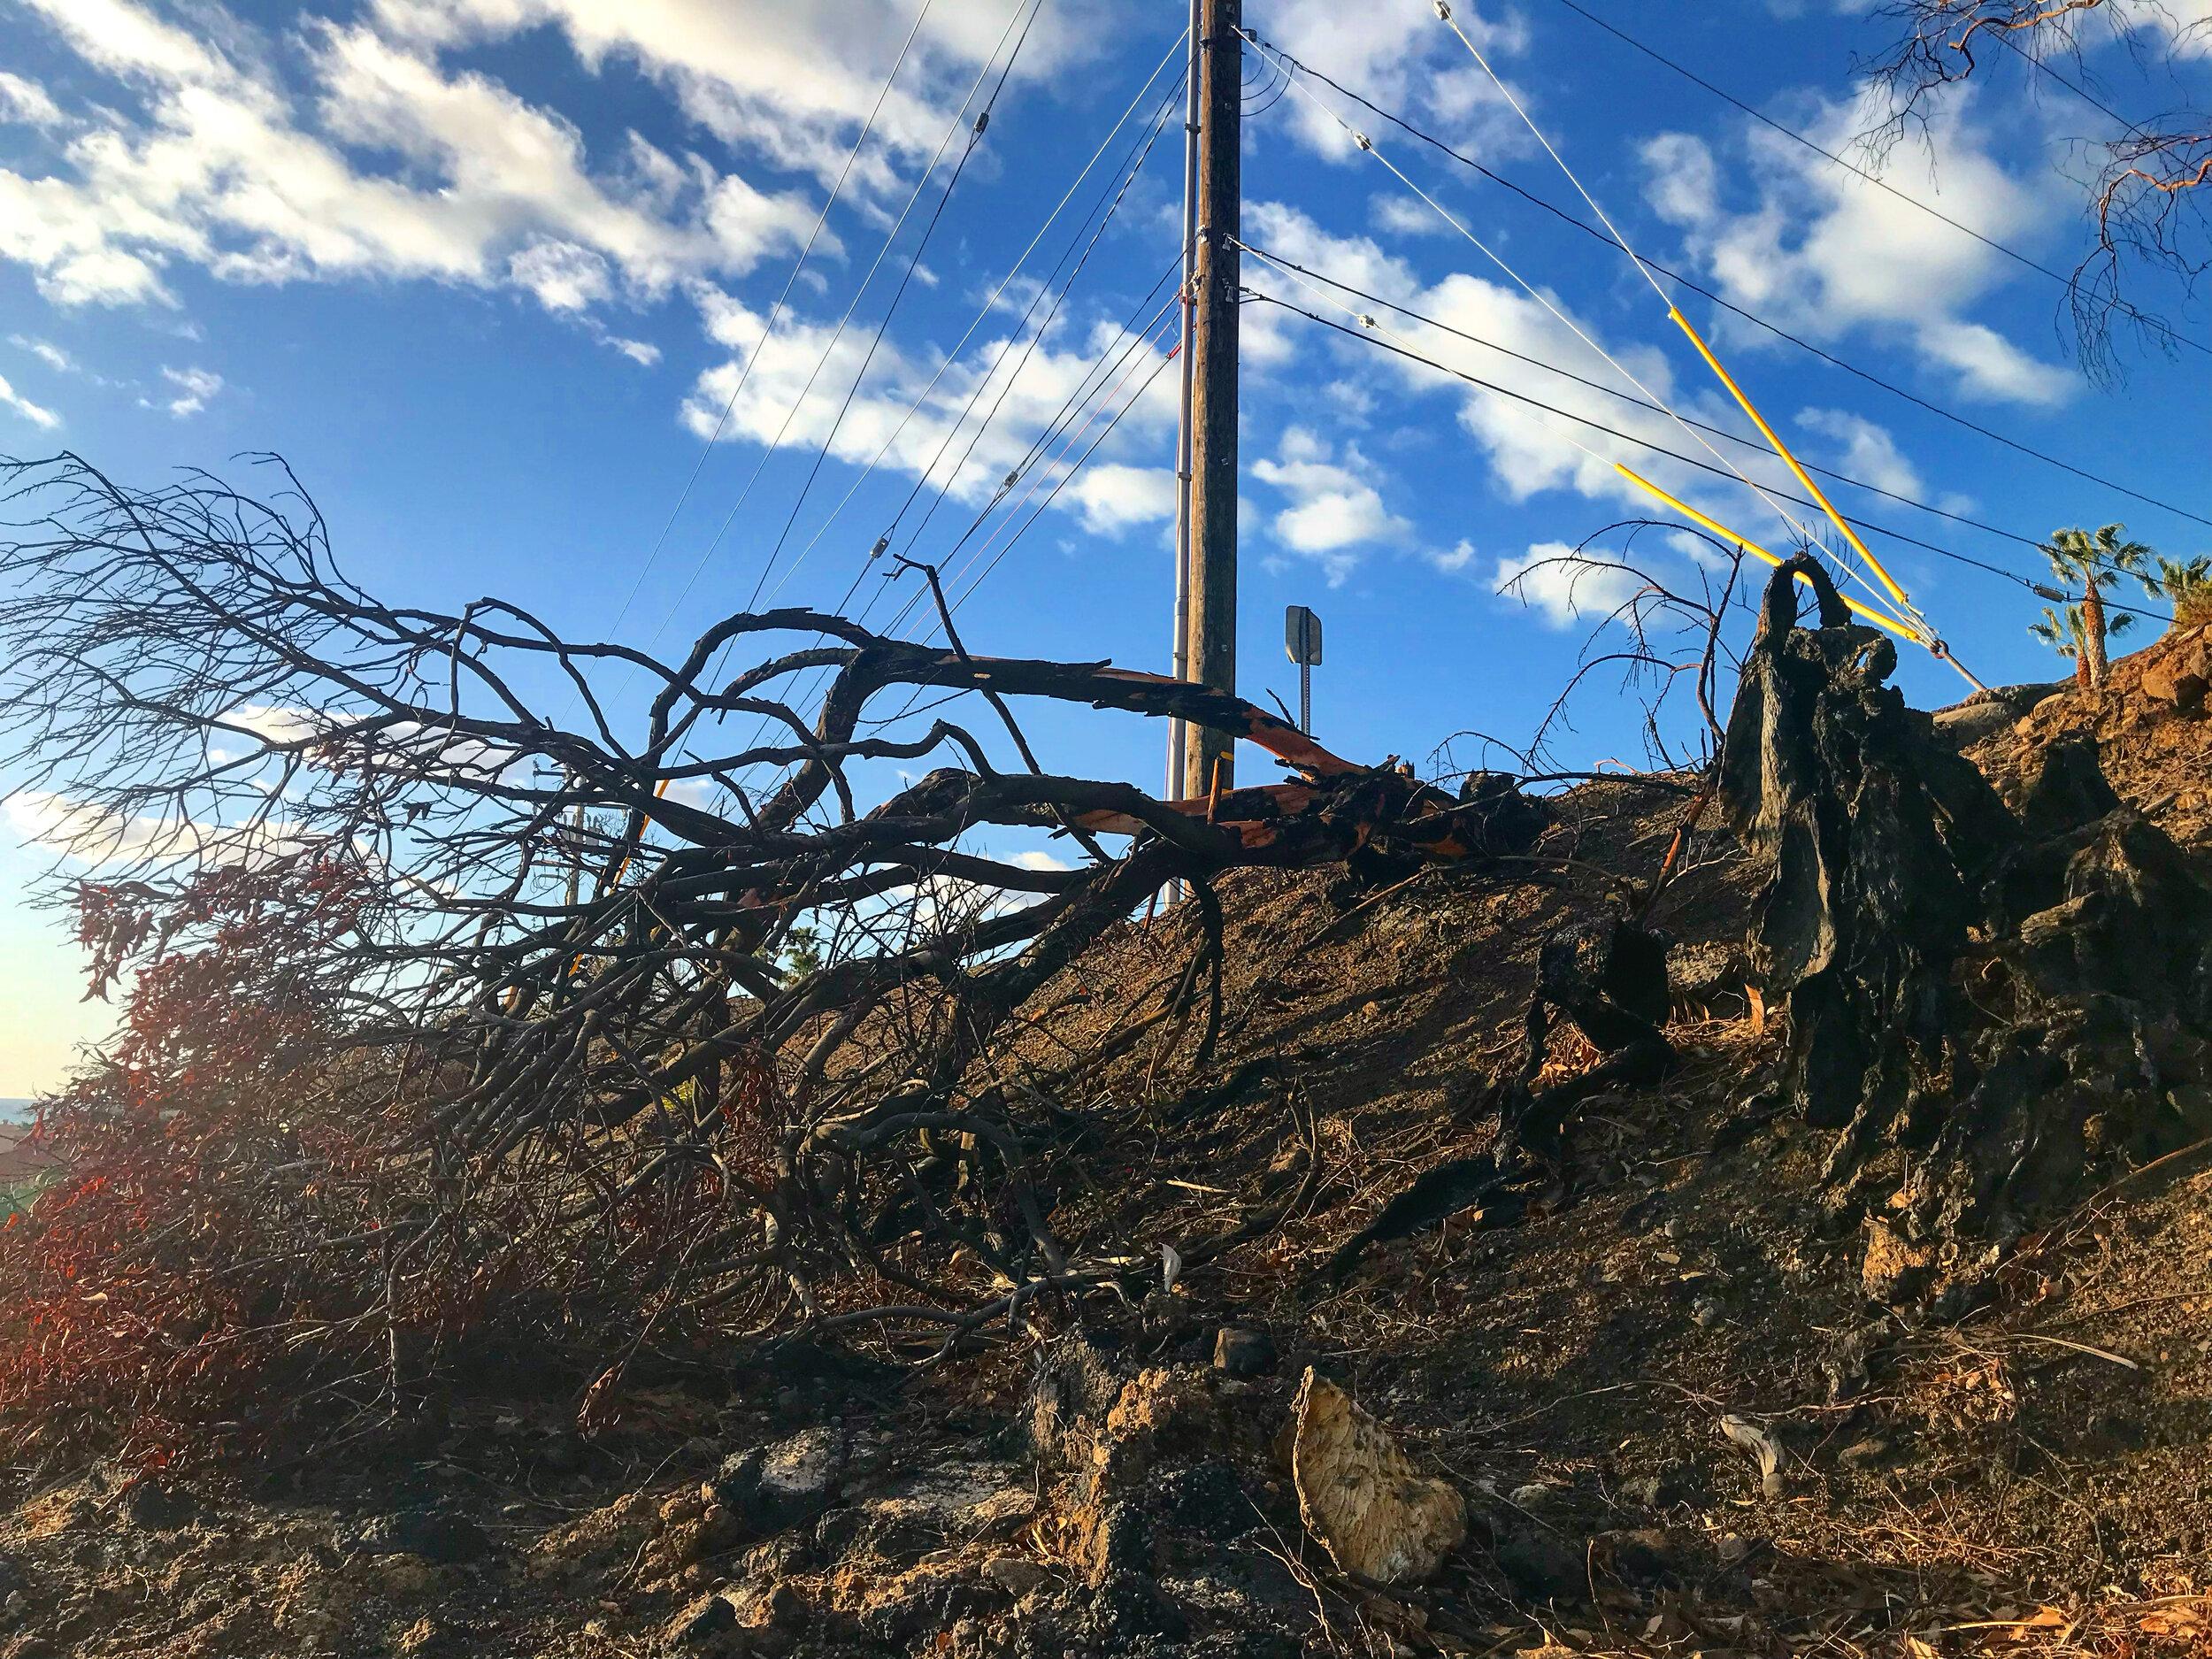 February 2019 - Black and Burned Trees on a hill in our neighborhood (📷: Lisa Butala Zabaldo)